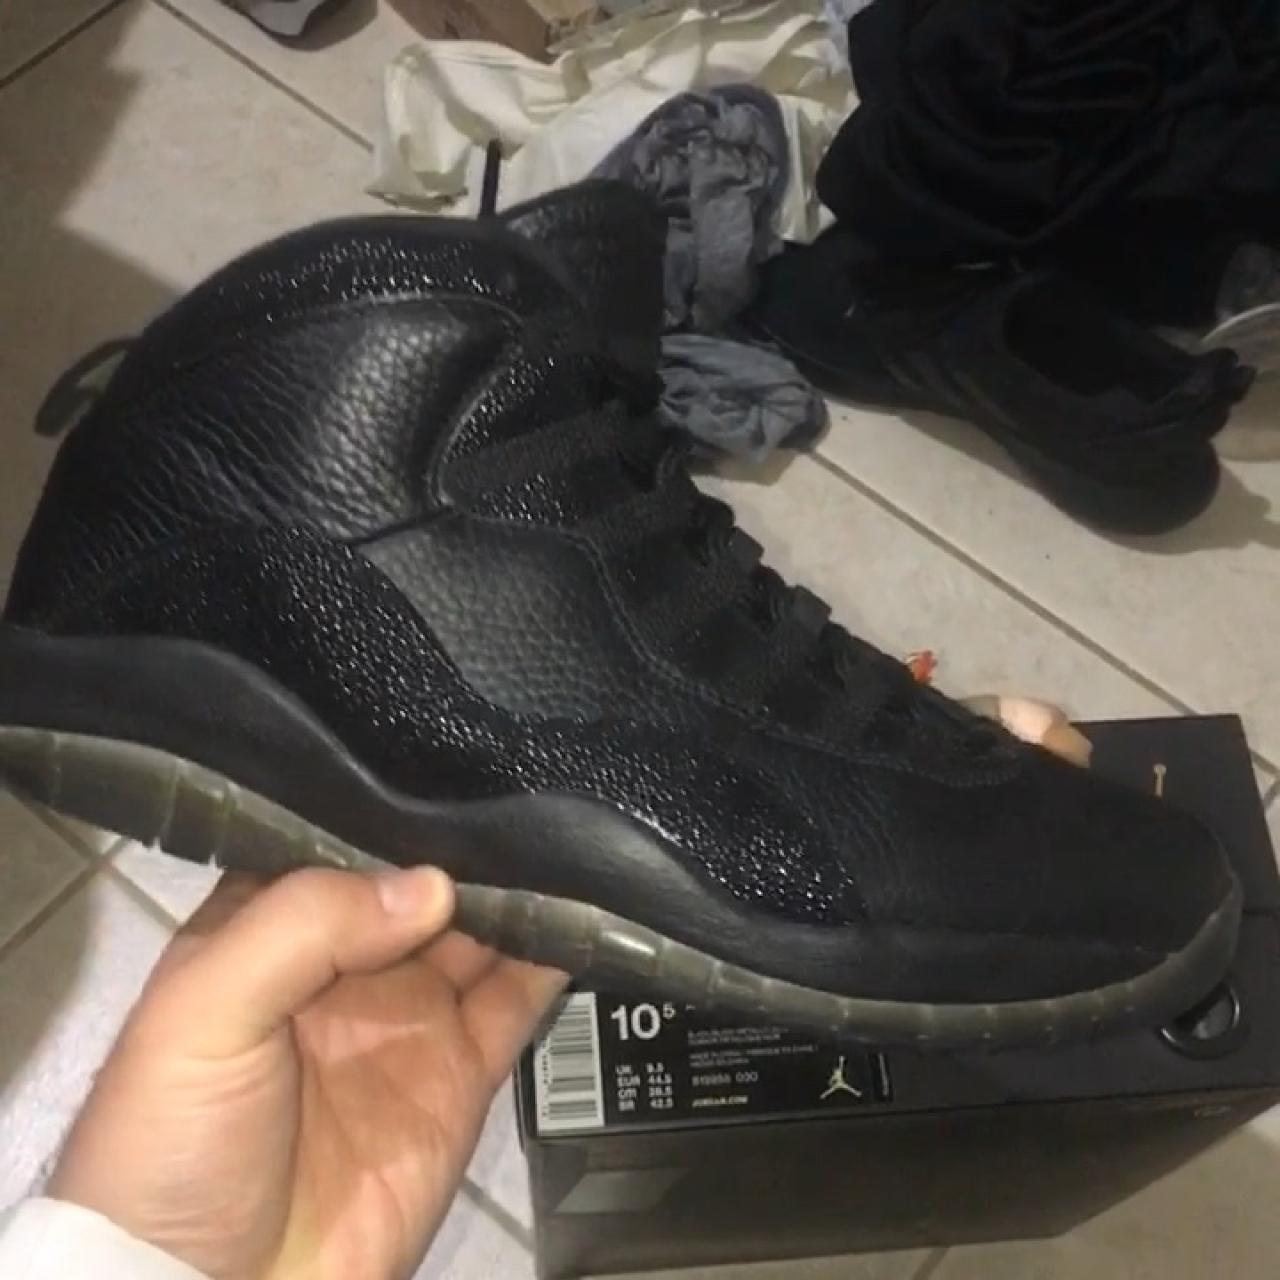 a5b0bf252b9 ITEM  Air Jordan Retro 10 x Drake OVO Sneakers STYLE CODE  - Depop